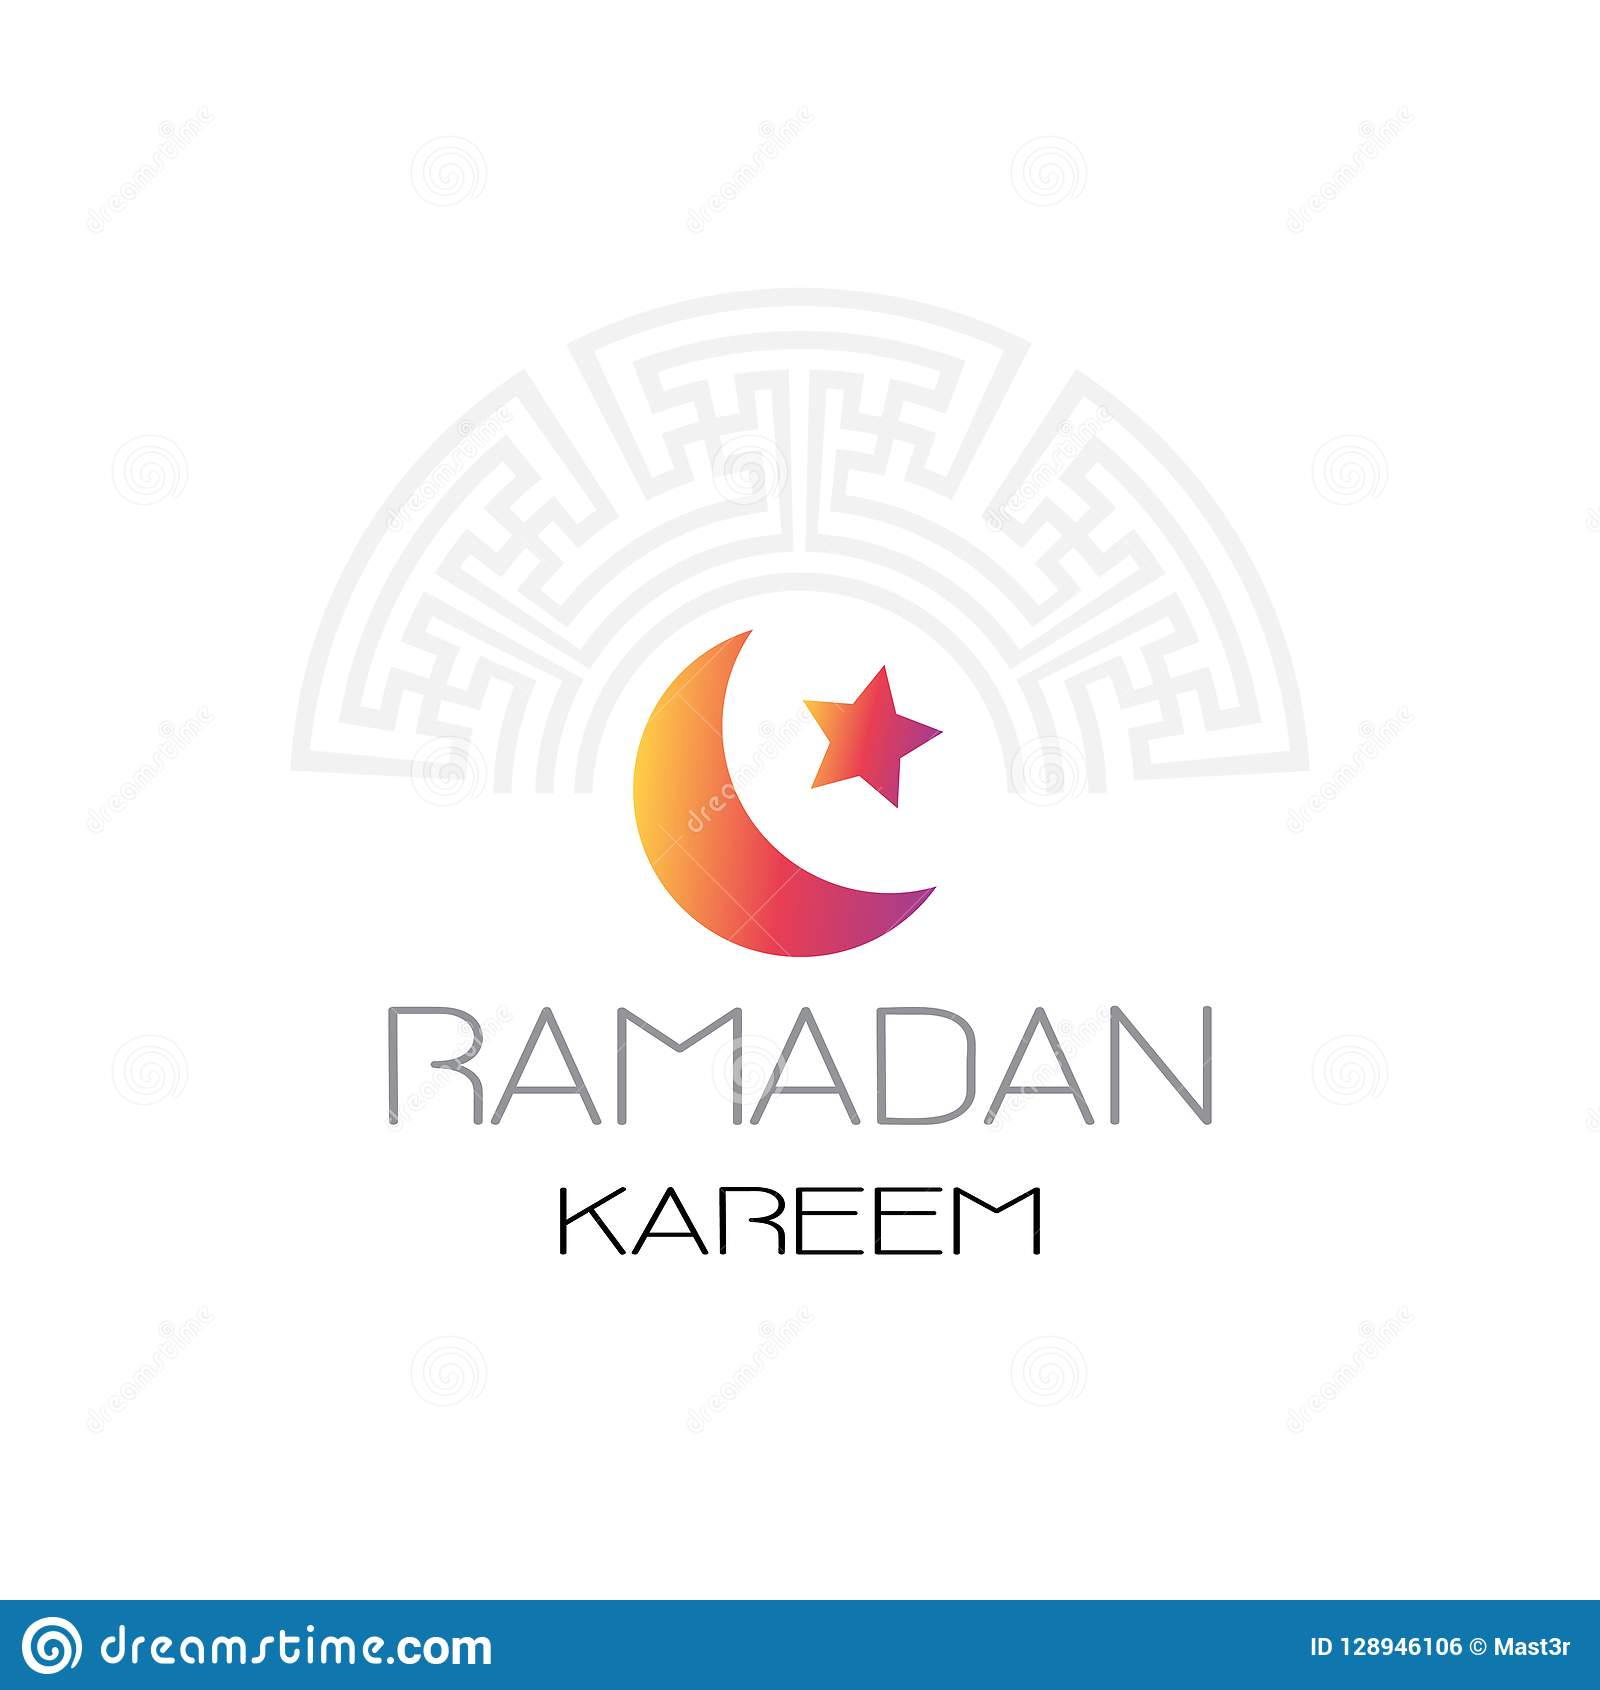 Ramadan kareem muslim religion holy month flat greeting card template on white background